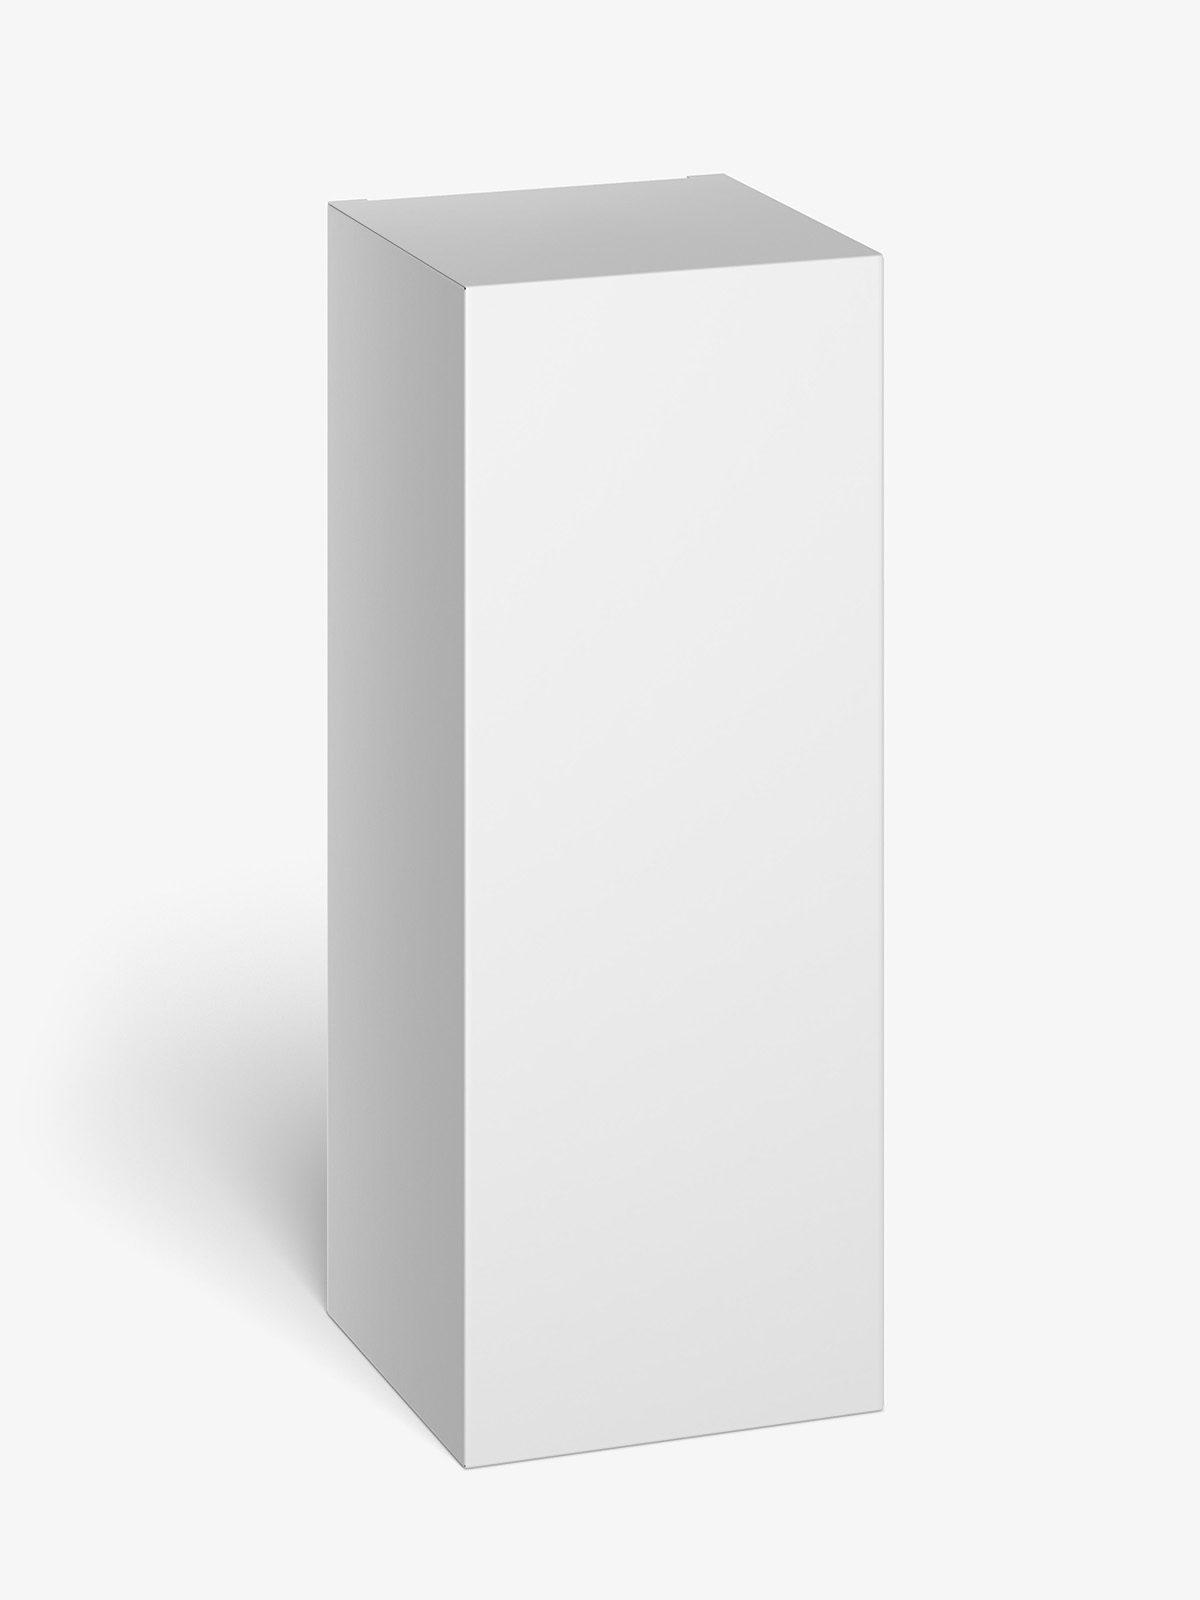 Box Mockup 50x130x50 Smarty Mockups